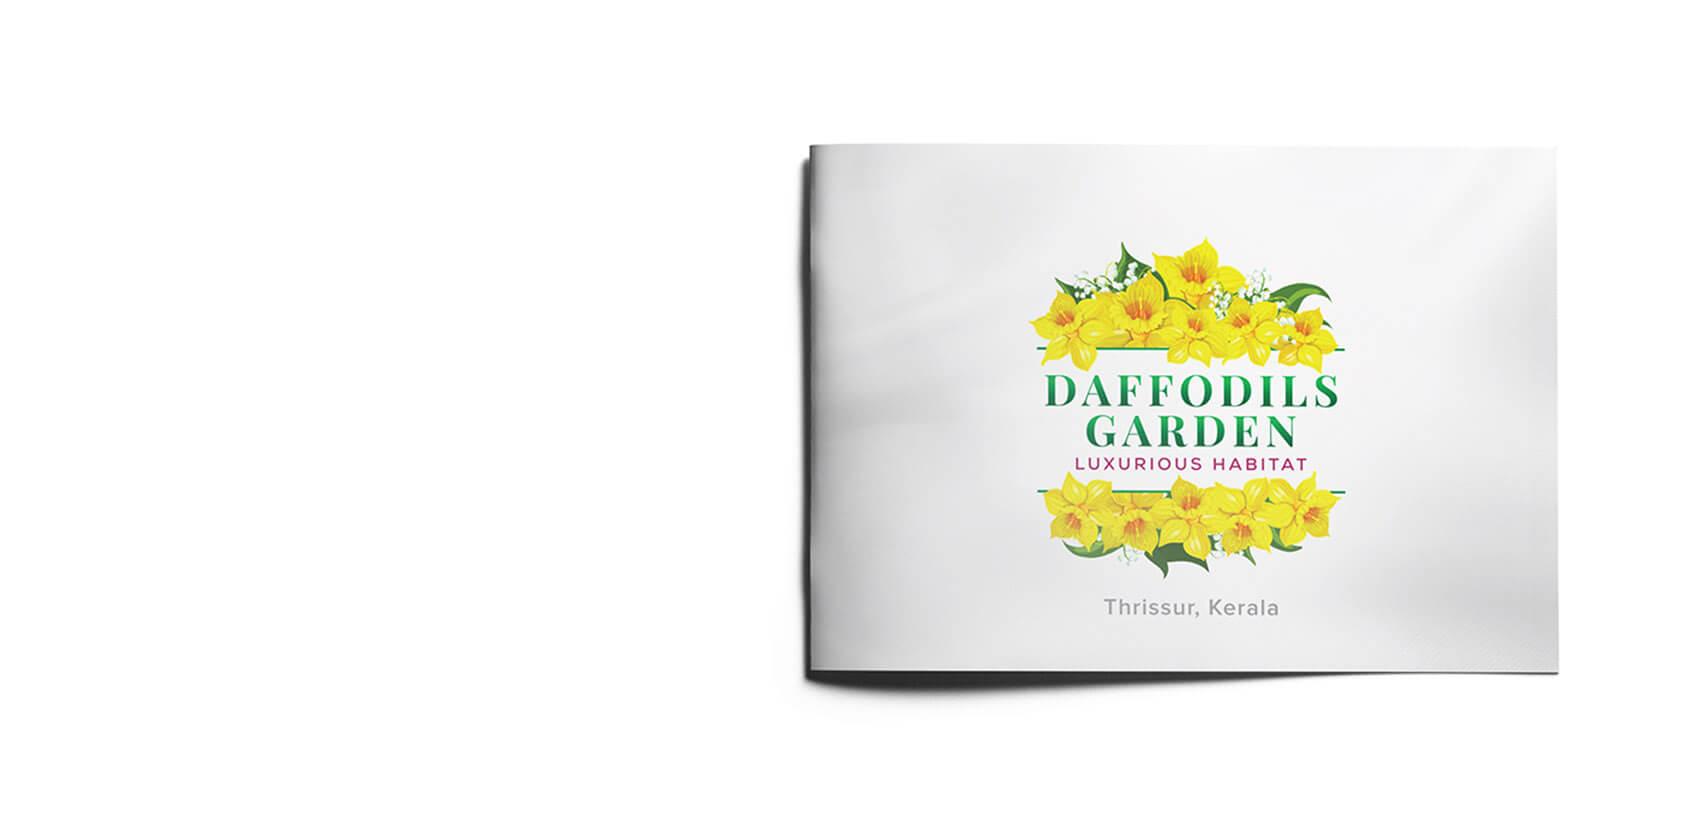 Daffodils Garden Branding Brochure Design Front Cover Vatitude